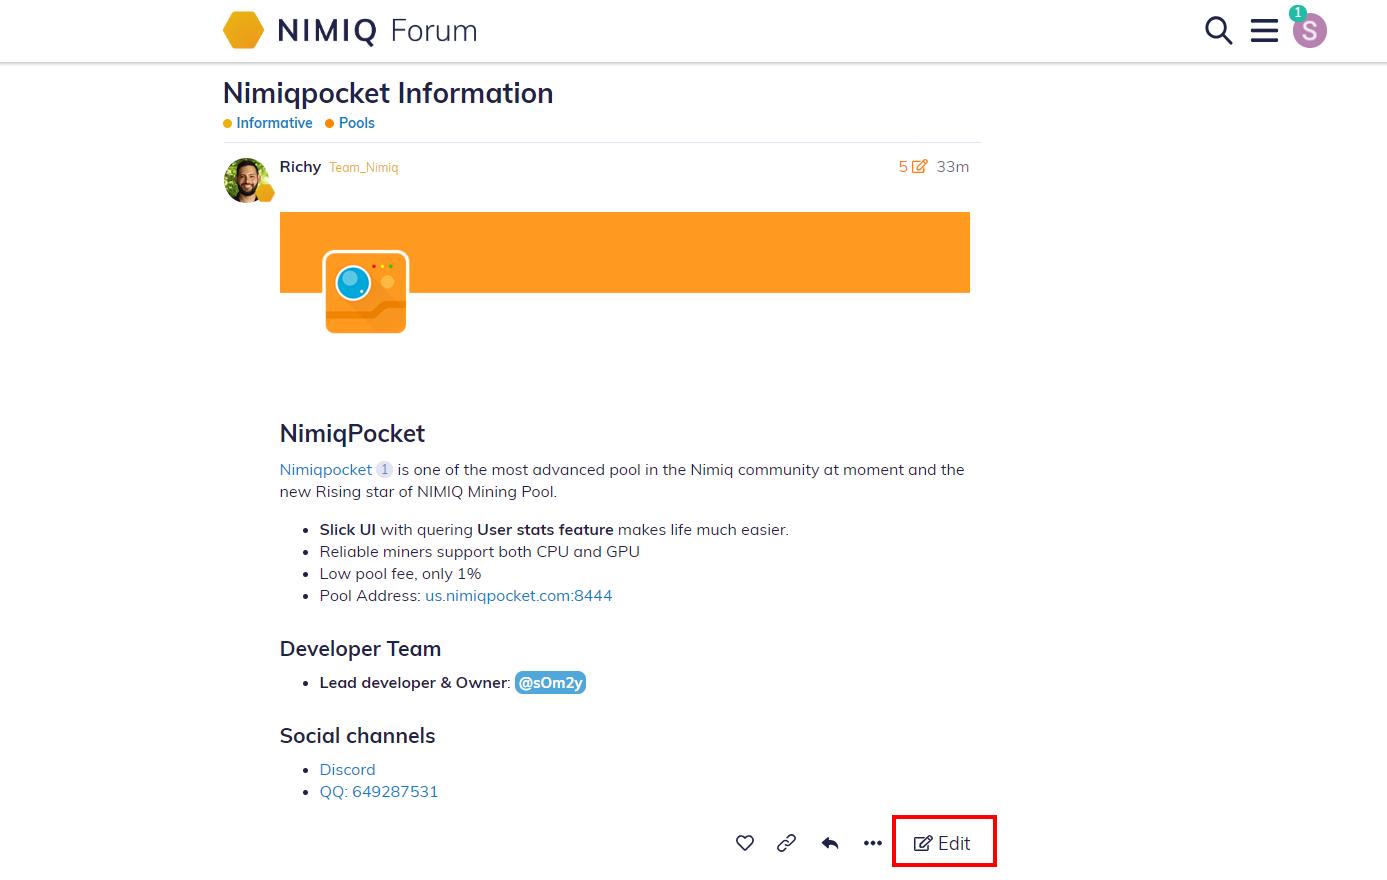 Nimiq Forum - How to edit a Wiki - Community Tutorials - Nimiq Forum